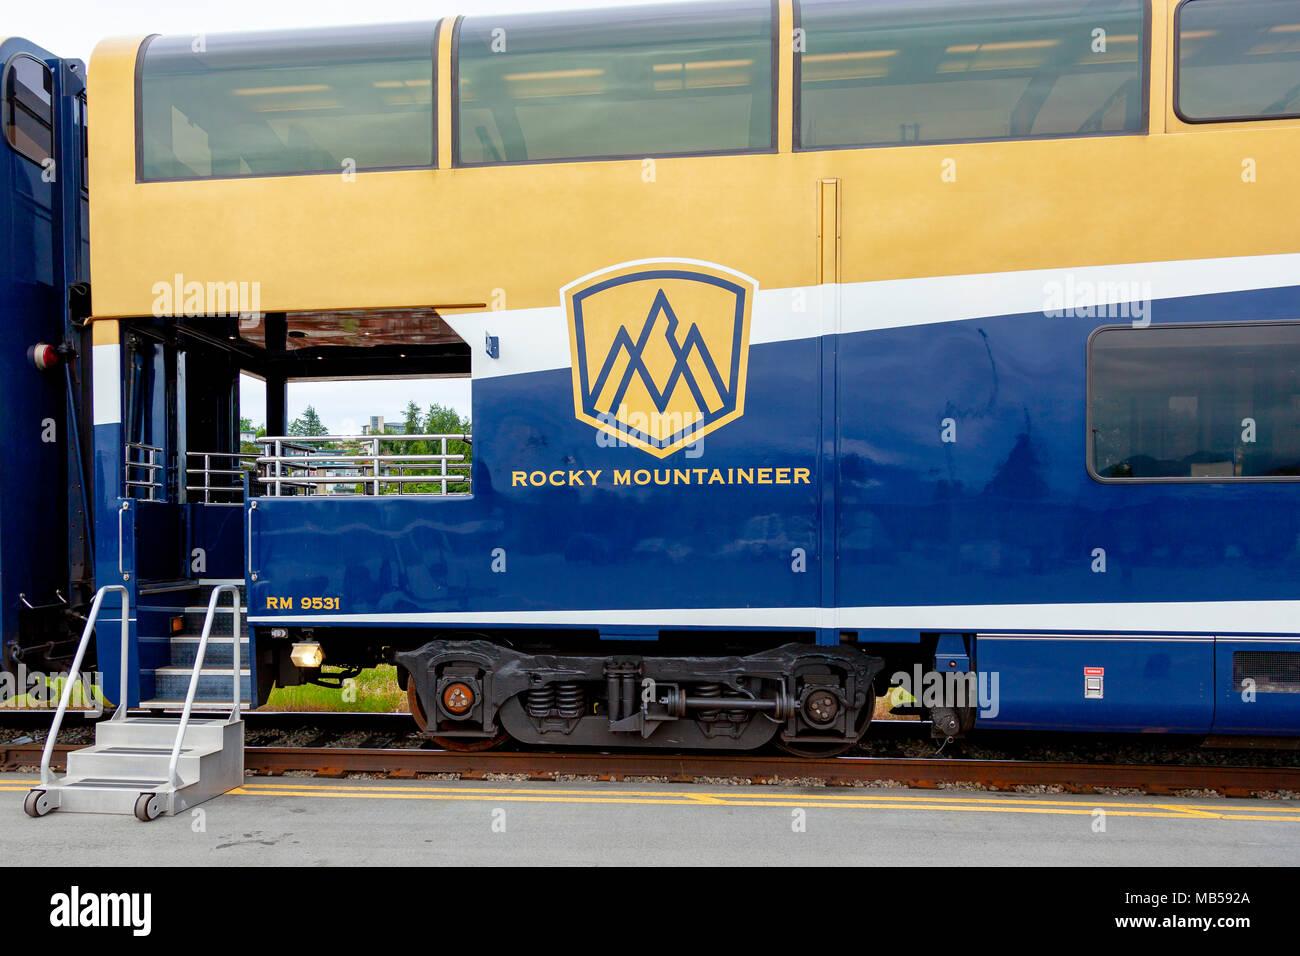 The Rocky Mountaineer Train, British Columbia, Canada - Stock Image